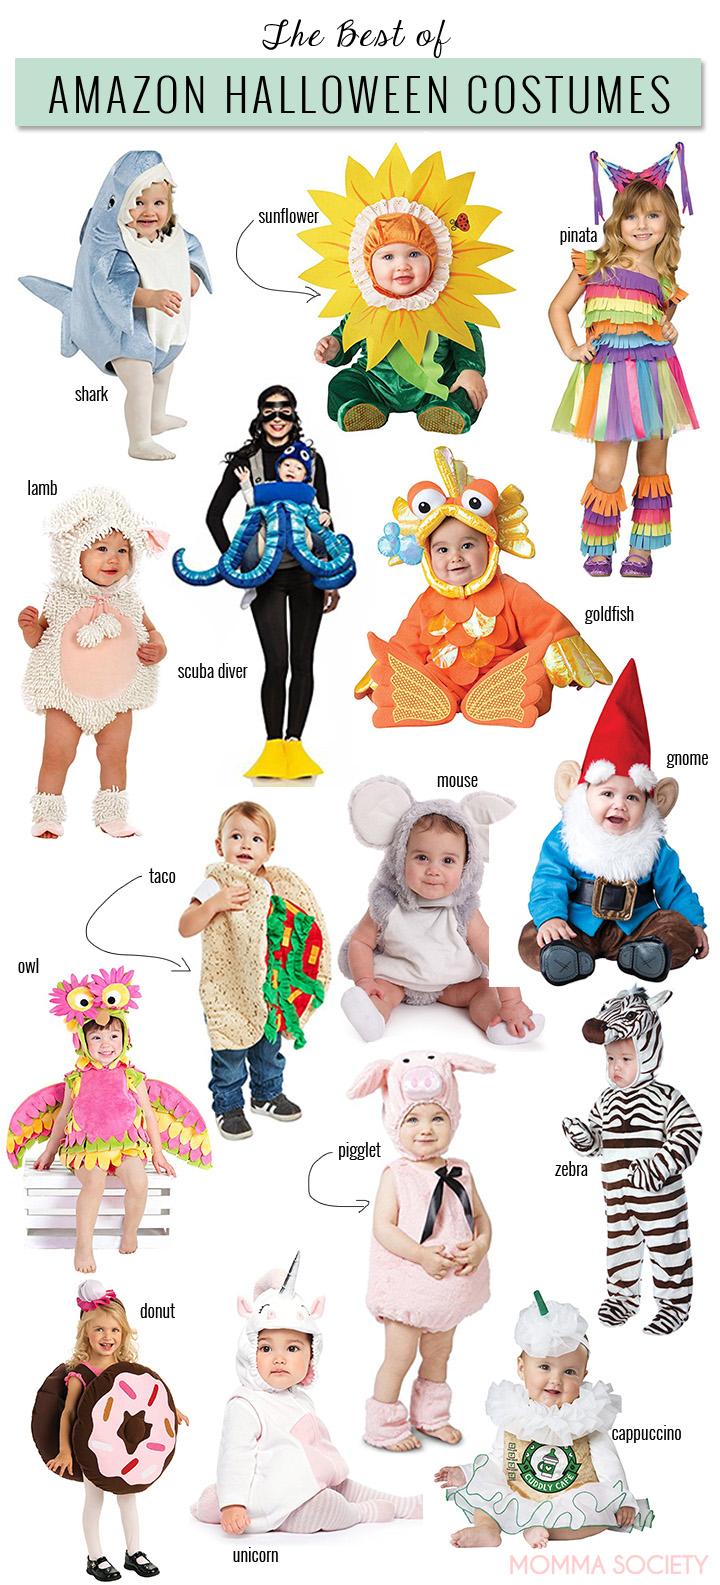 c3bbb2ffb Best Halloween Costumes on Amazon | Toddler & Baby Halloween costumes |  Costume Ideas | Halloween